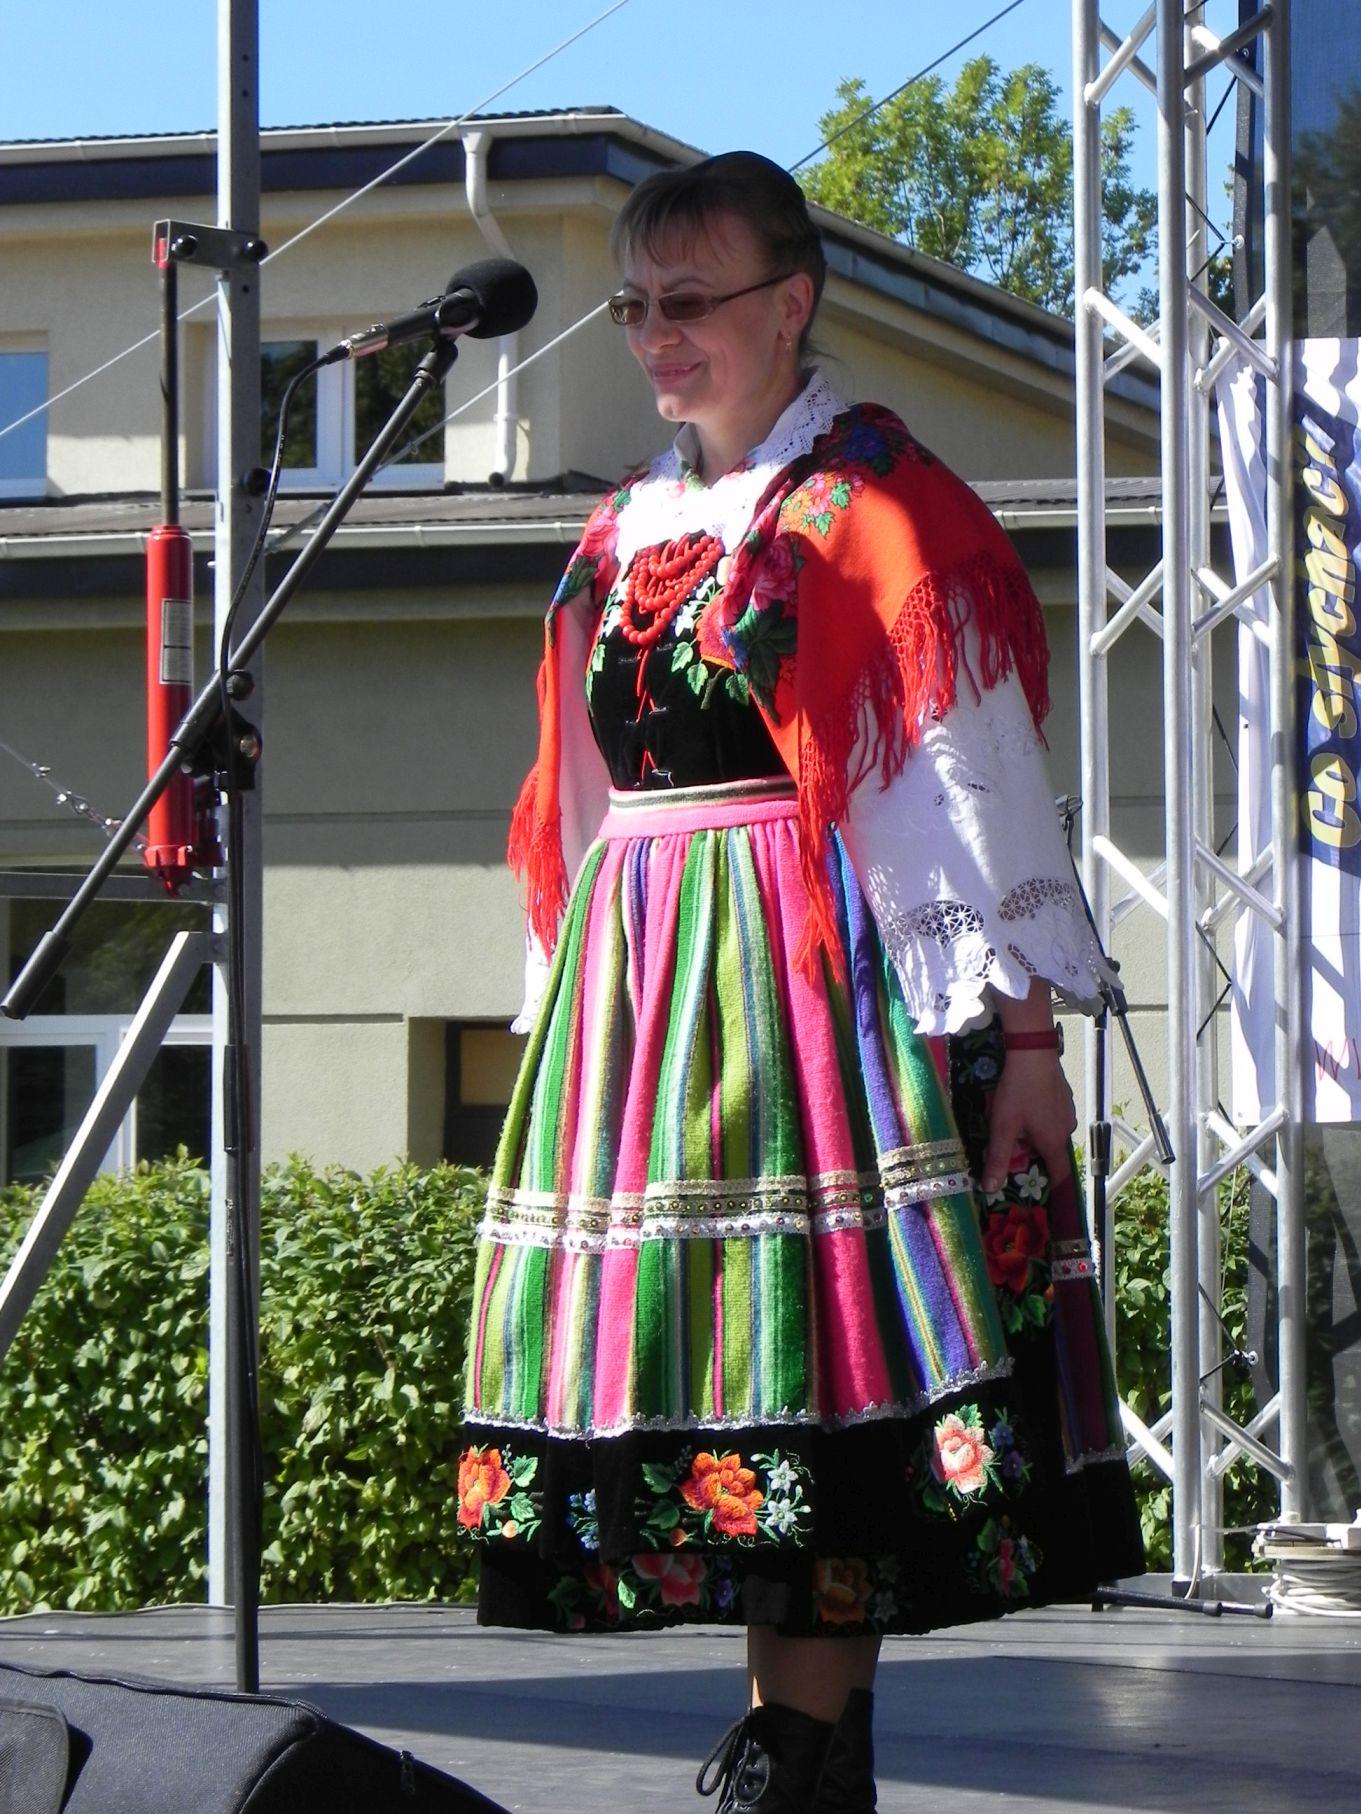 2013-09-10 Festyn - Mińsk Maz (12)